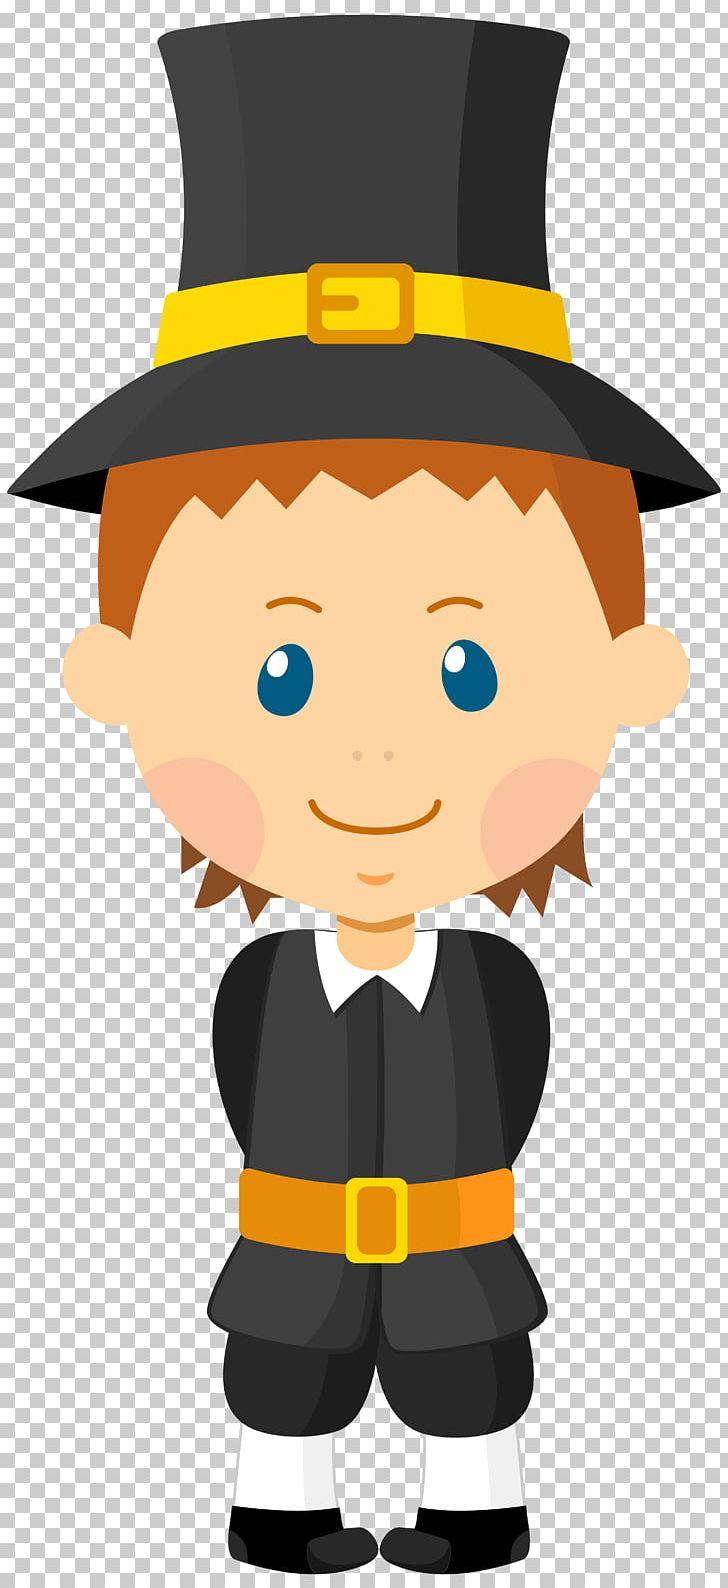 Pilgrims png cartoon child. Mayflower clipart pilgrim boy